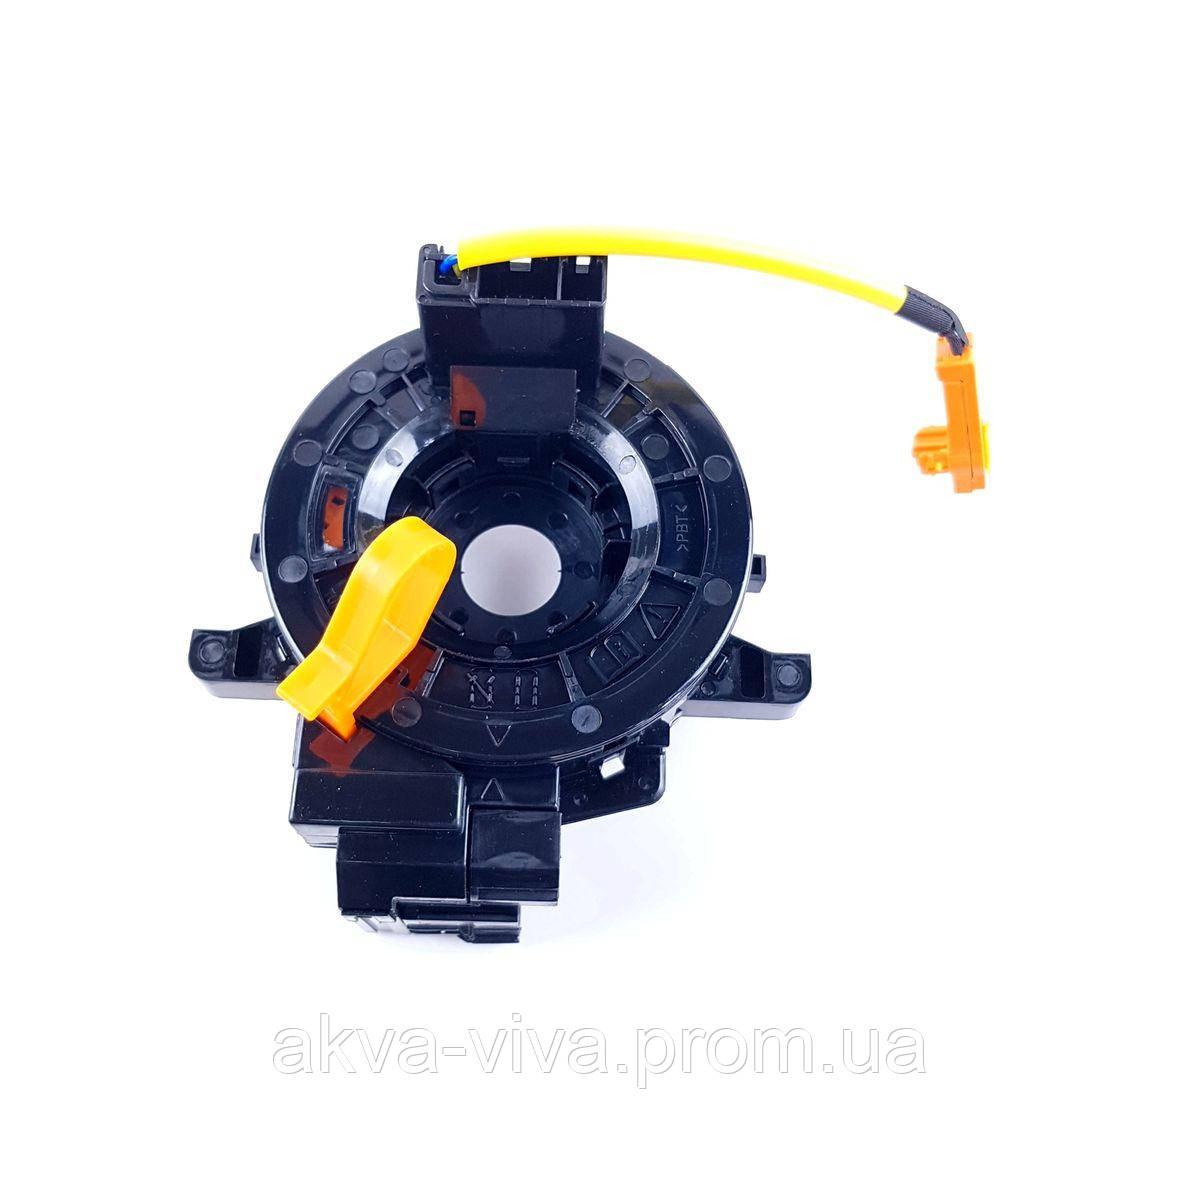 Шлейф руля (улитка руля) для Toyota Altis, Camry, Corolla, Yaris, Vios № 84306-06080